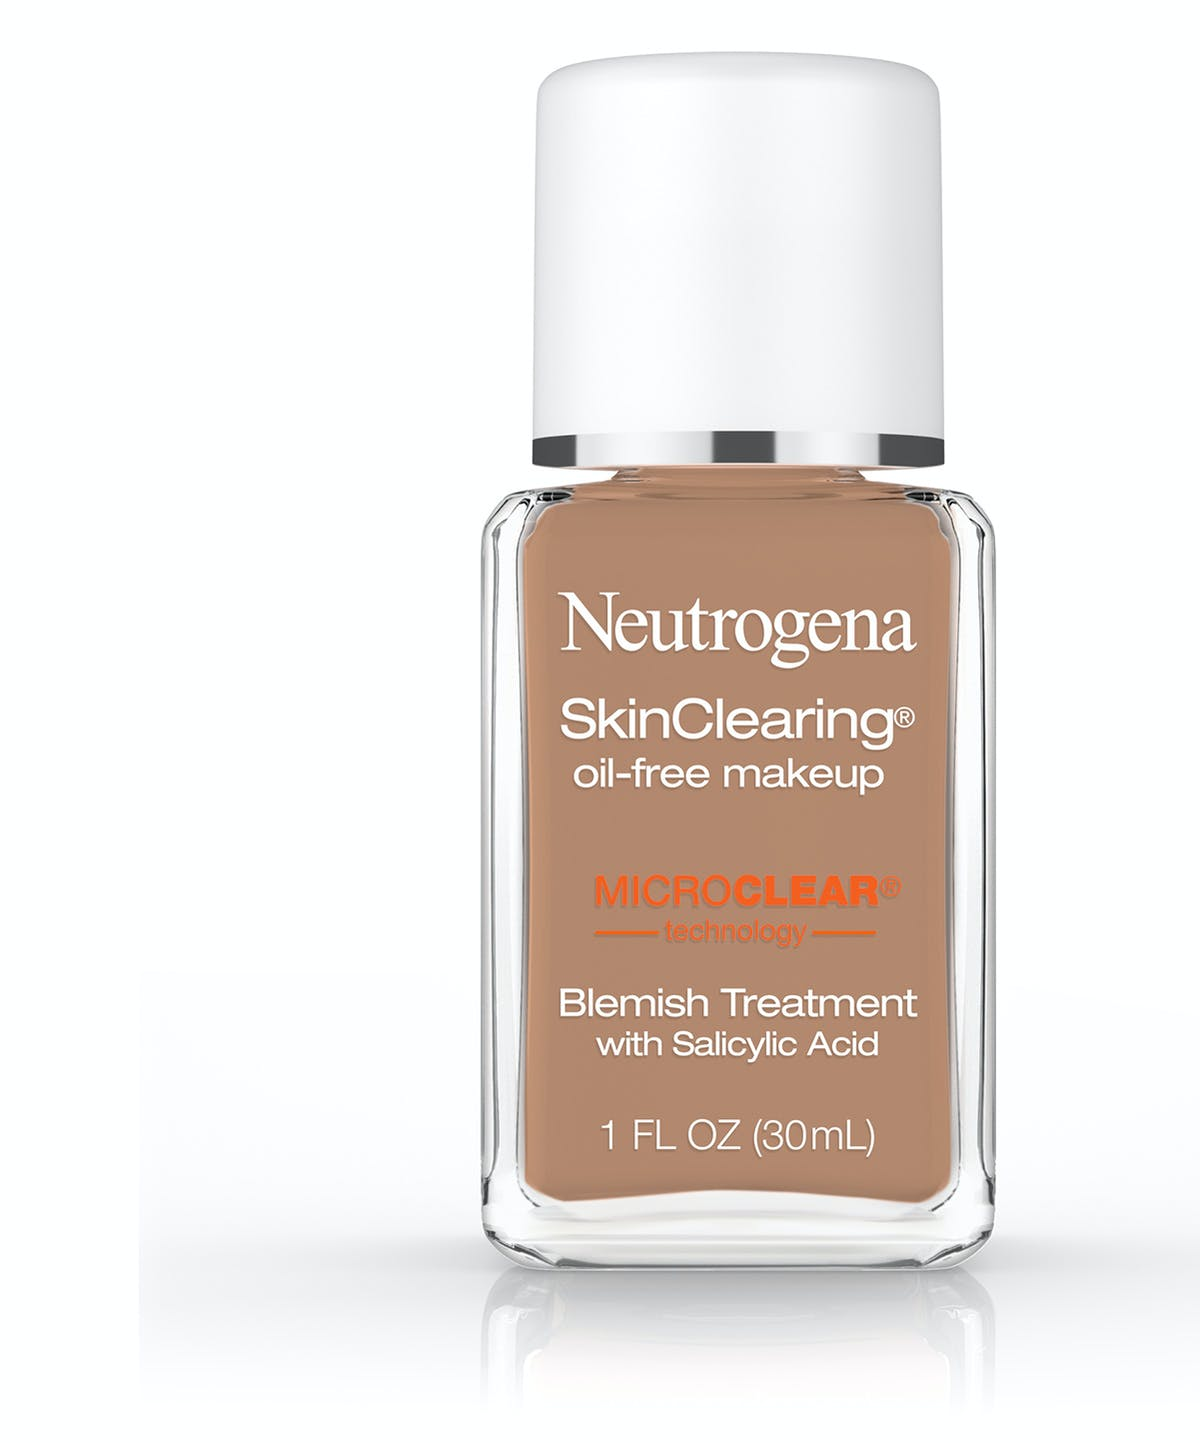 Neutrogena Skin Clearing Makeup